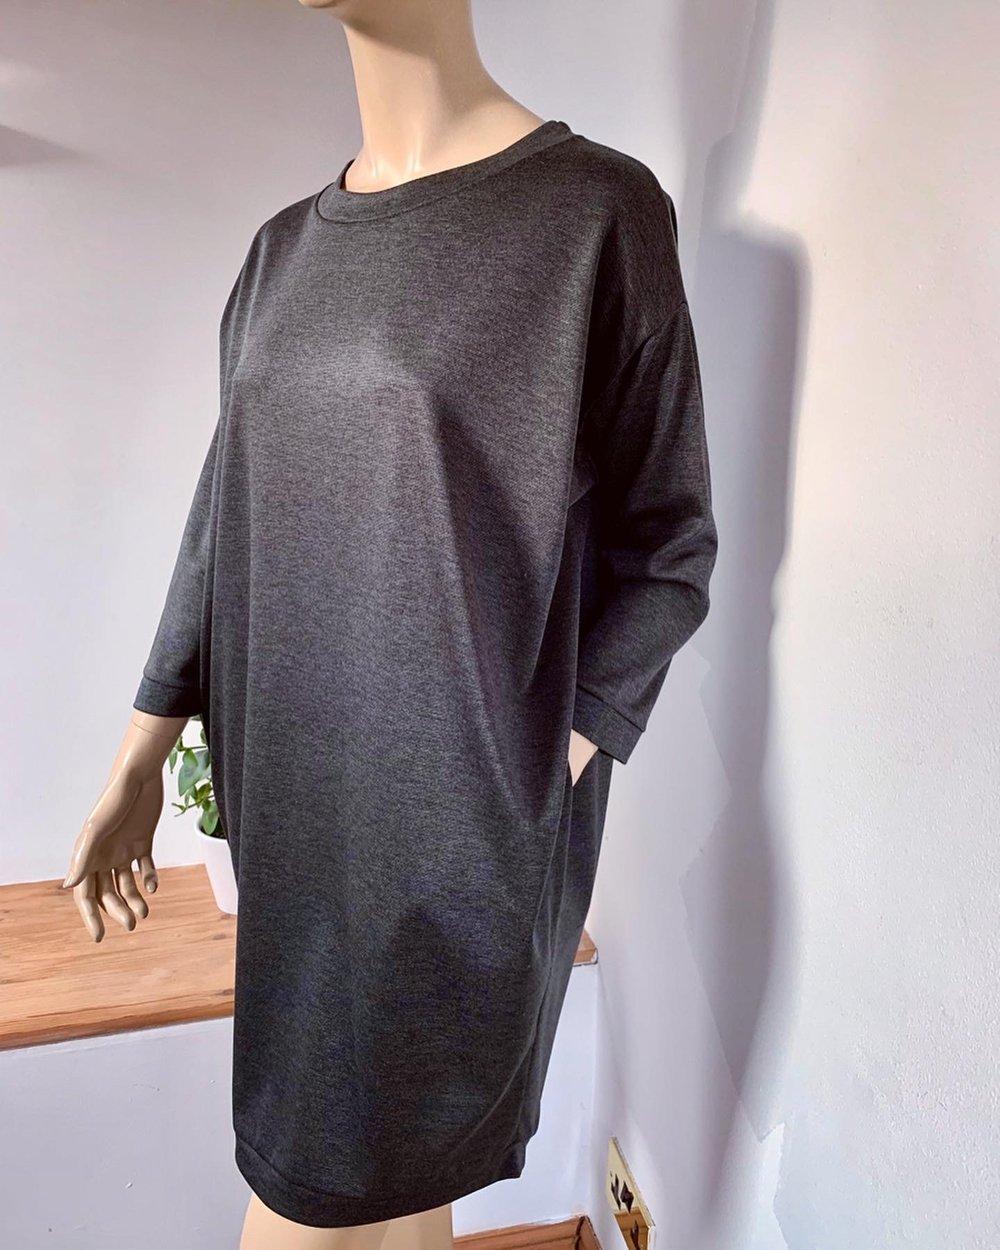 Milano jumper dress with pockets & sleeves - thicker fabrics